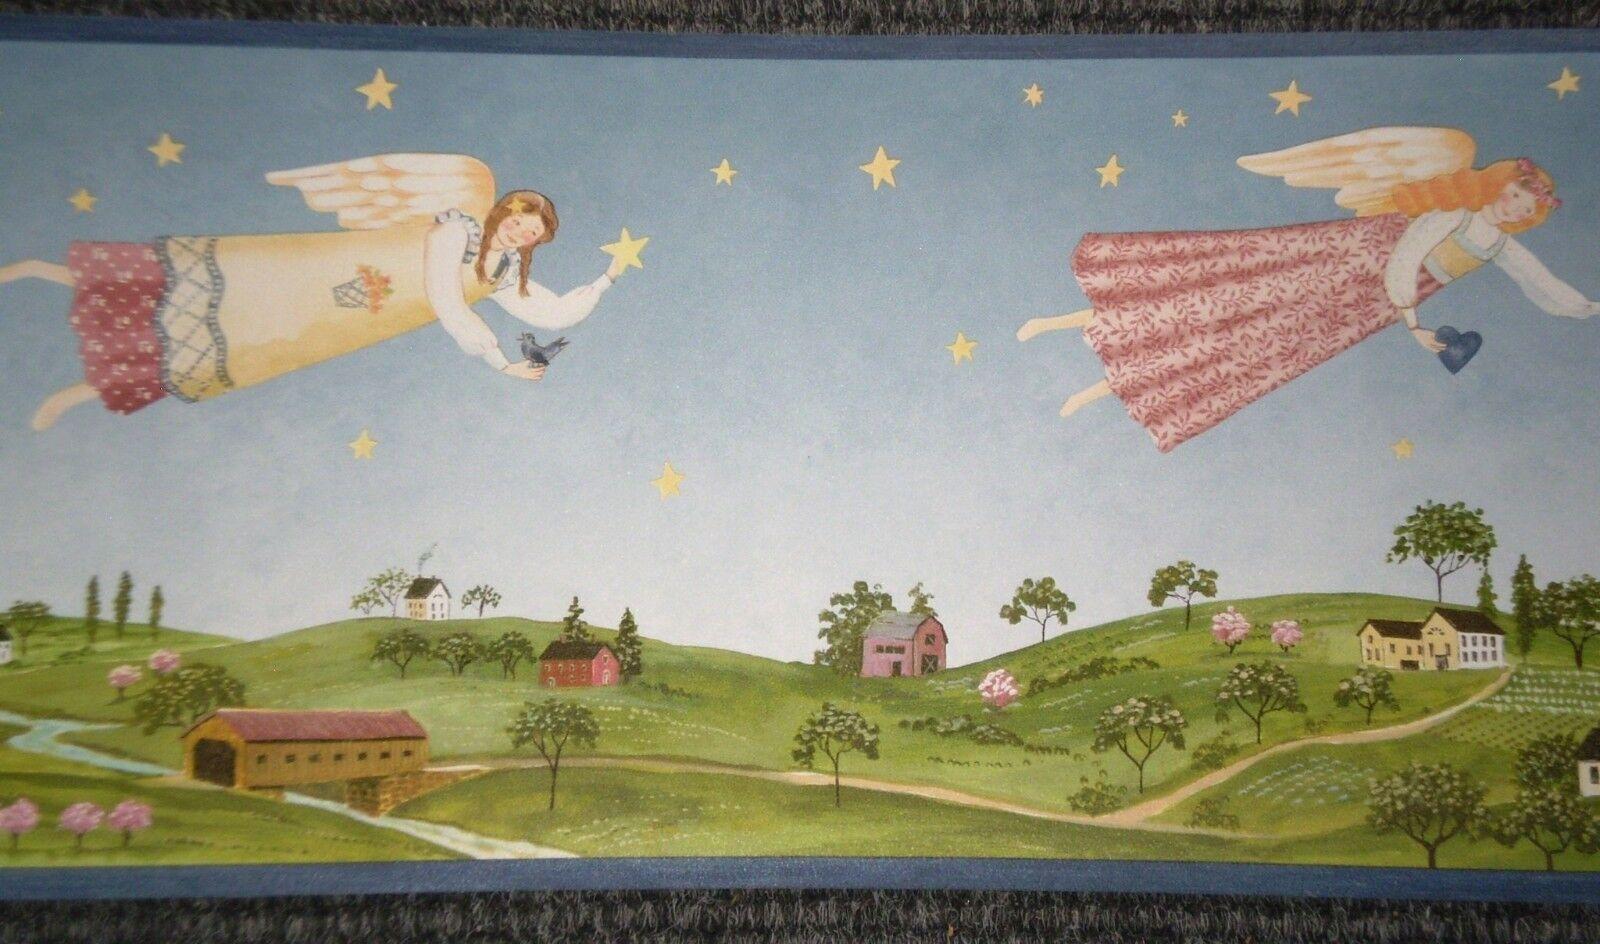 Wallpaper Border American Folk Art Angels Stars Sky Birds Hearts Blue Trim